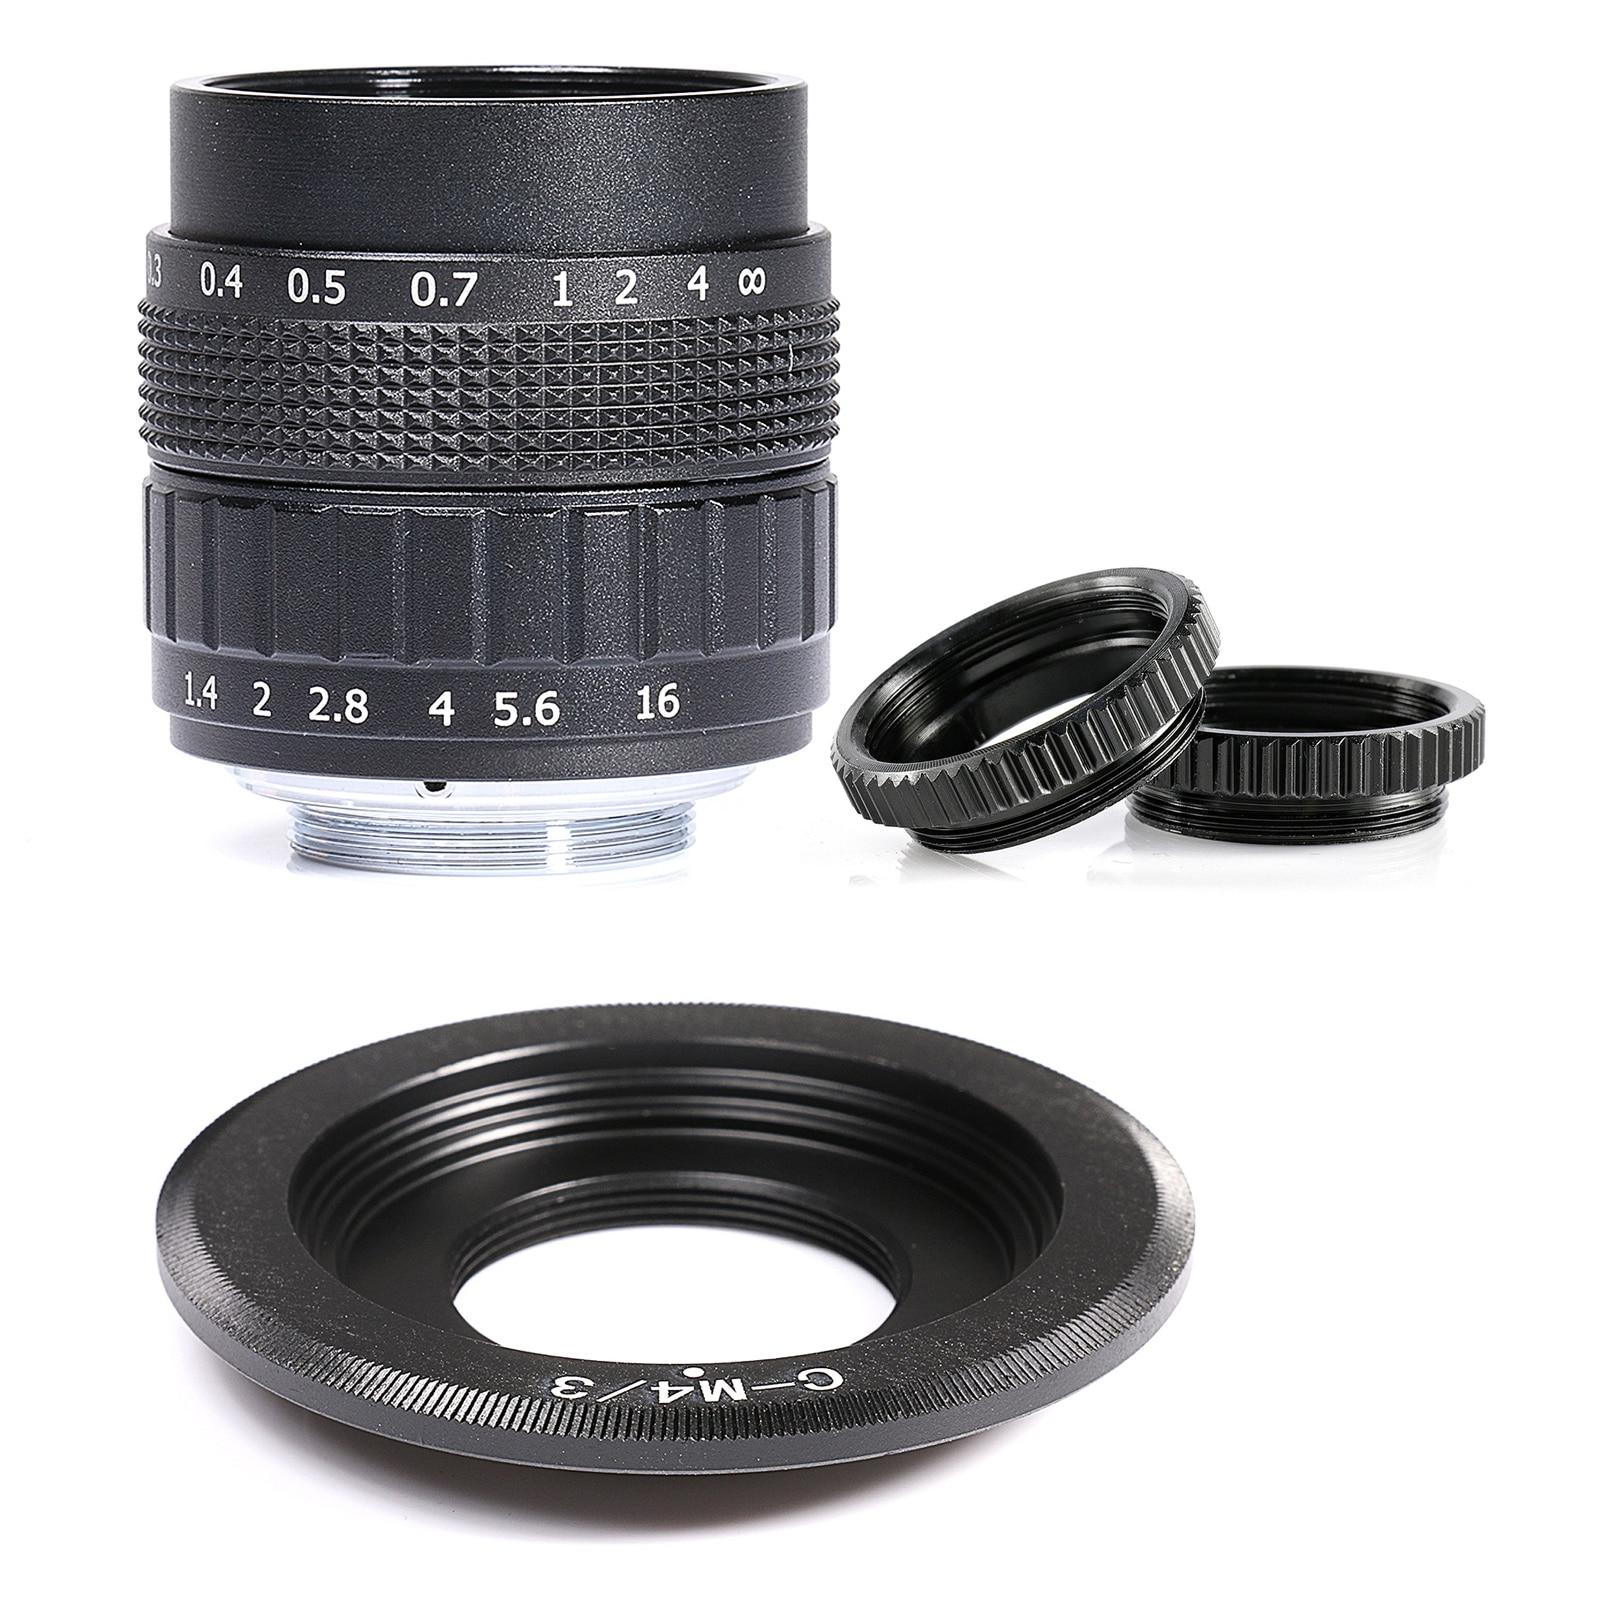 Fujian 50mm f/1,4 APS-C lente CCTV + anillo adaptador + 2 anillo Macro para P anonic/O linpus Micro4/3 M4/3 cámara sin espejo